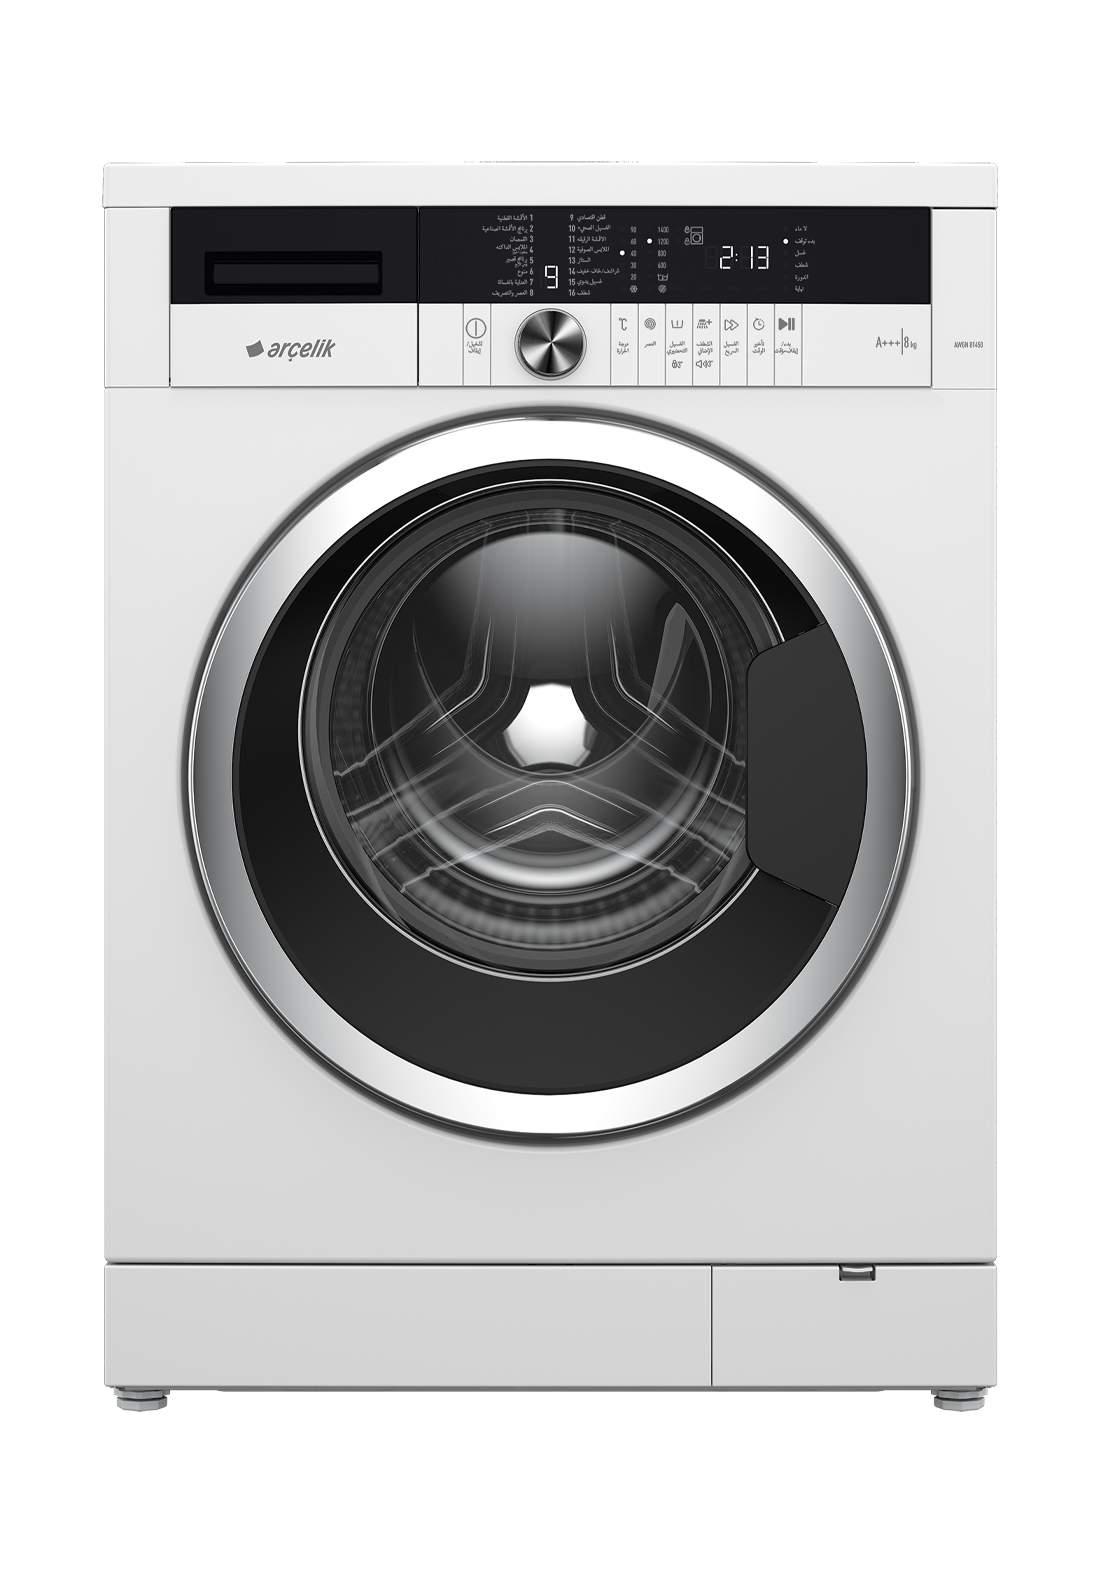 Arcelik AWN 41044 Washing machine 10 kg white غسالة 10 كيلو